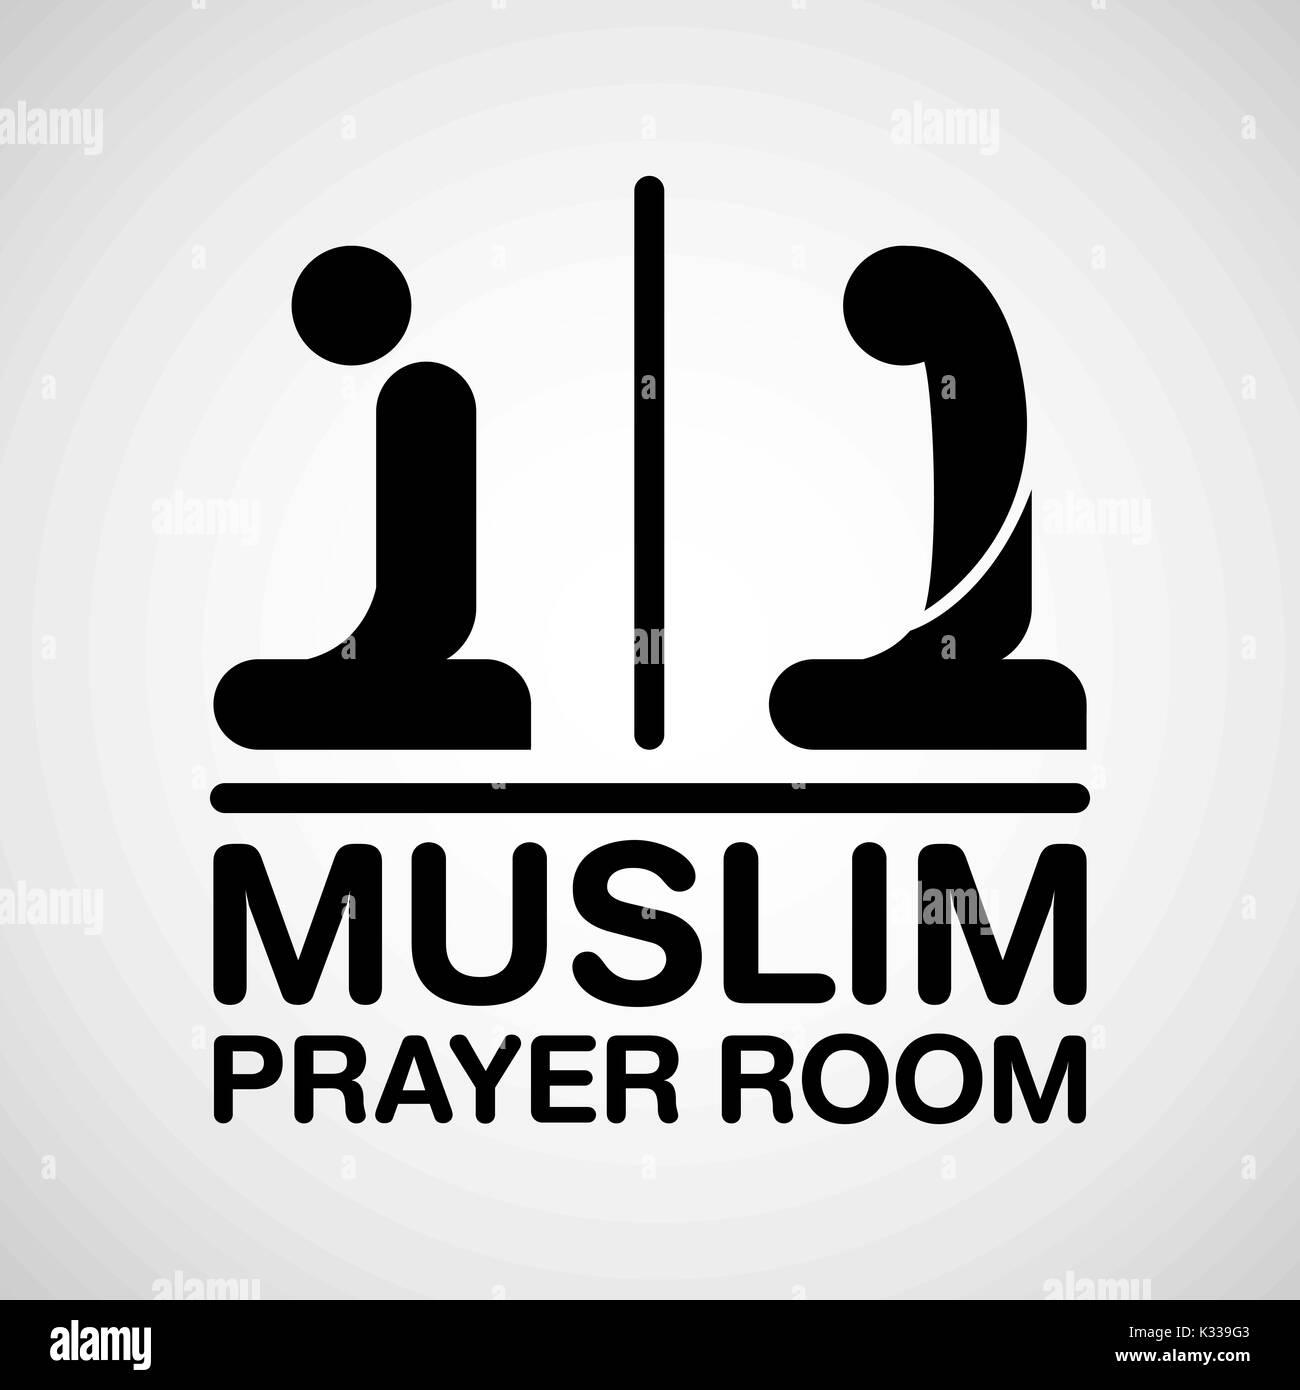 Islamic Prayer Room Design